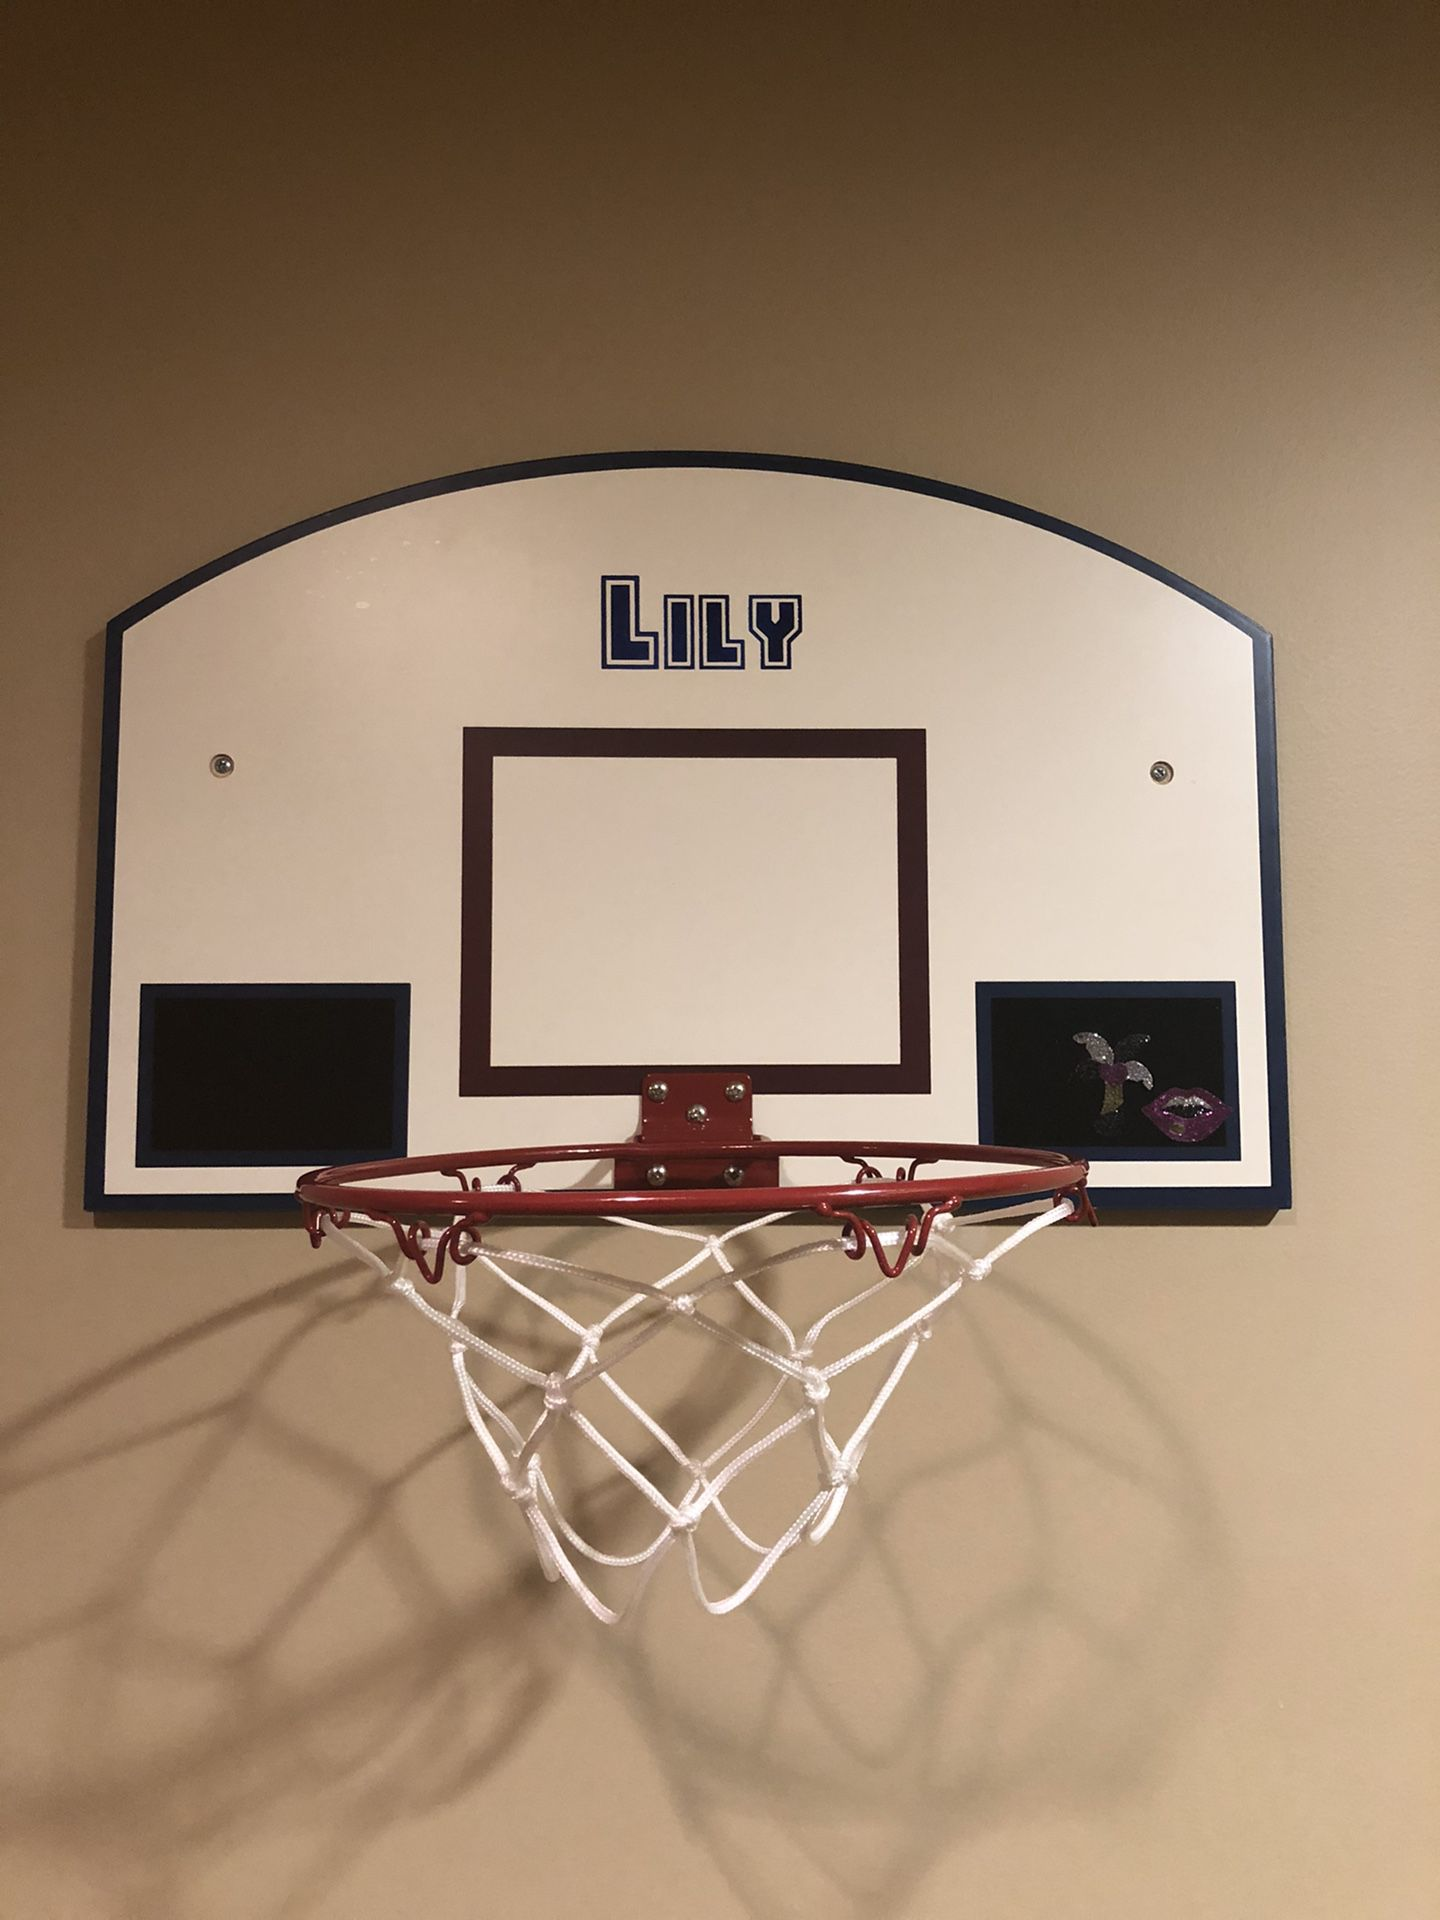 Hanging custom named basketball hoop